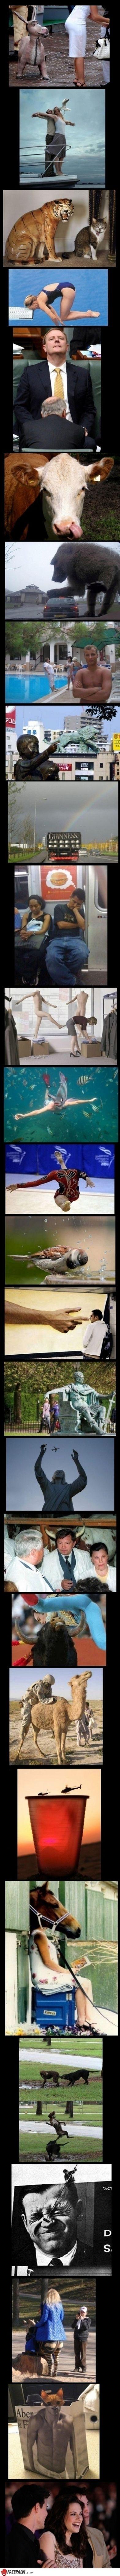 Perfect Timing Photos